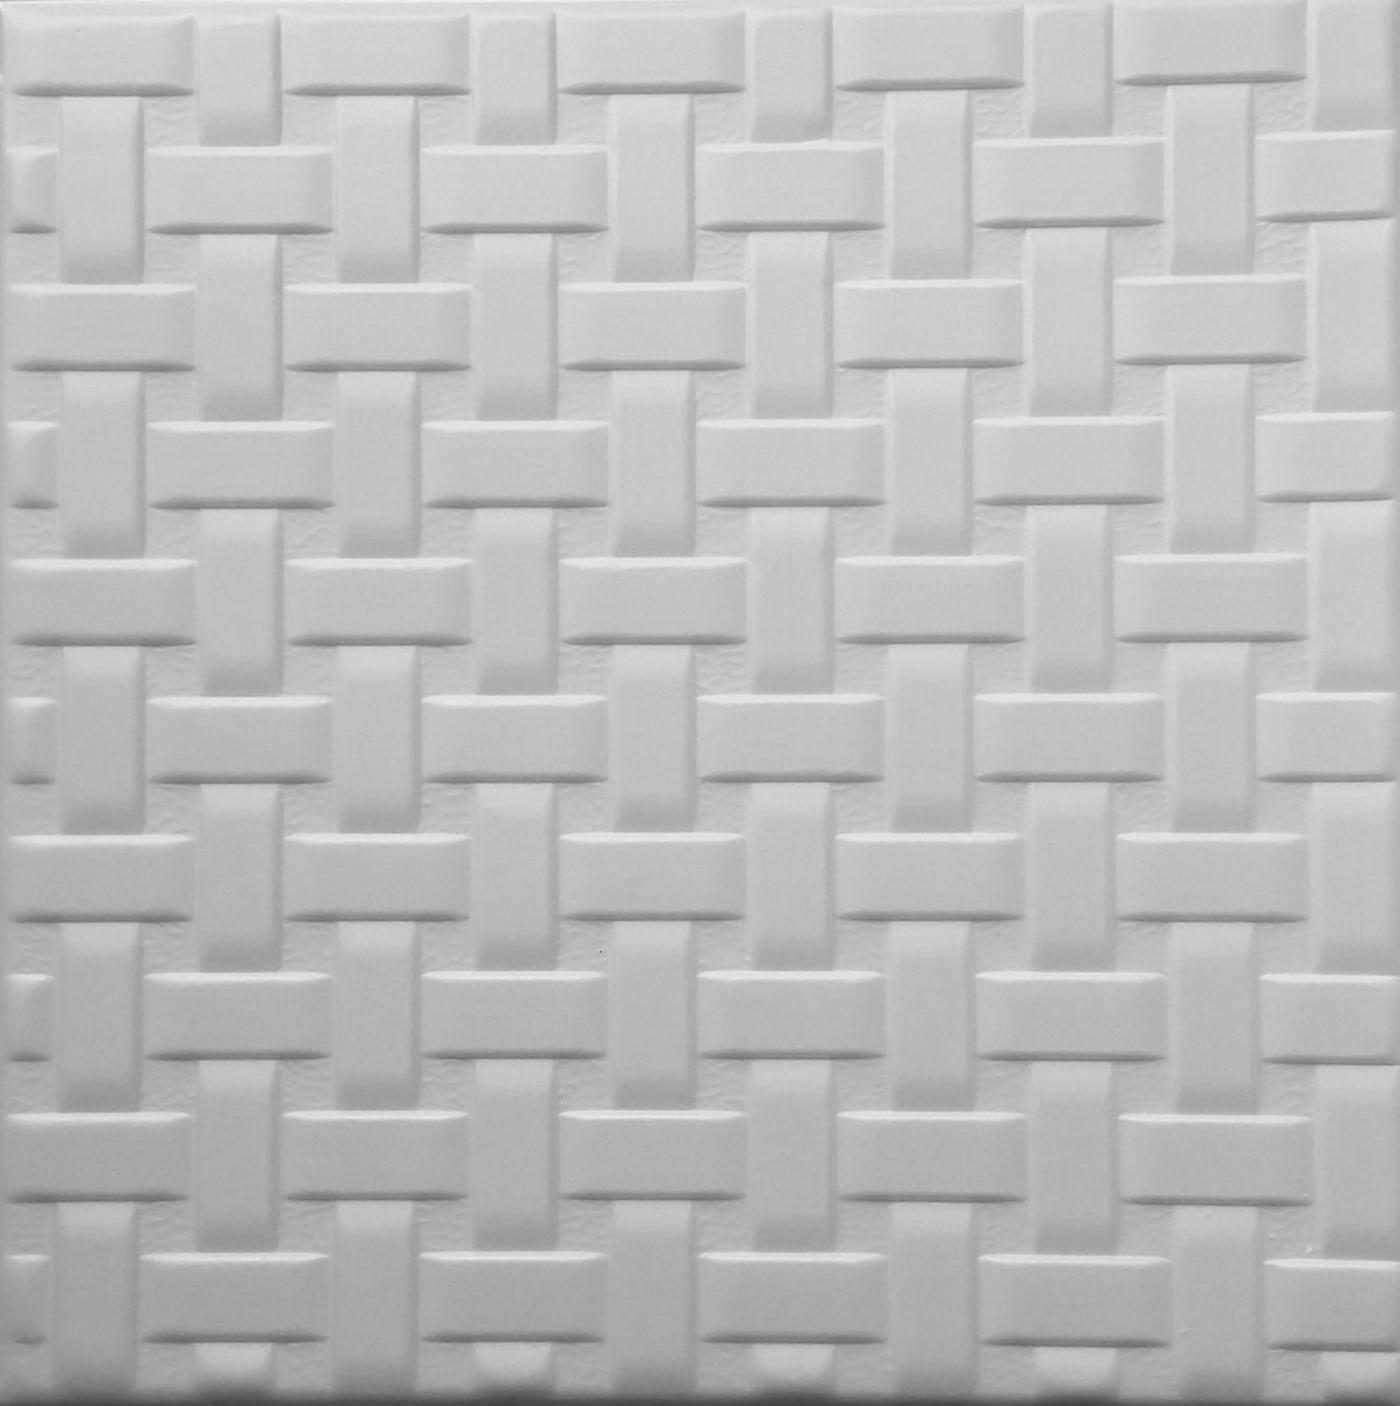 RM72 Polystyrene ceiling tiles - Ceiling Tiles - Talissa Decor